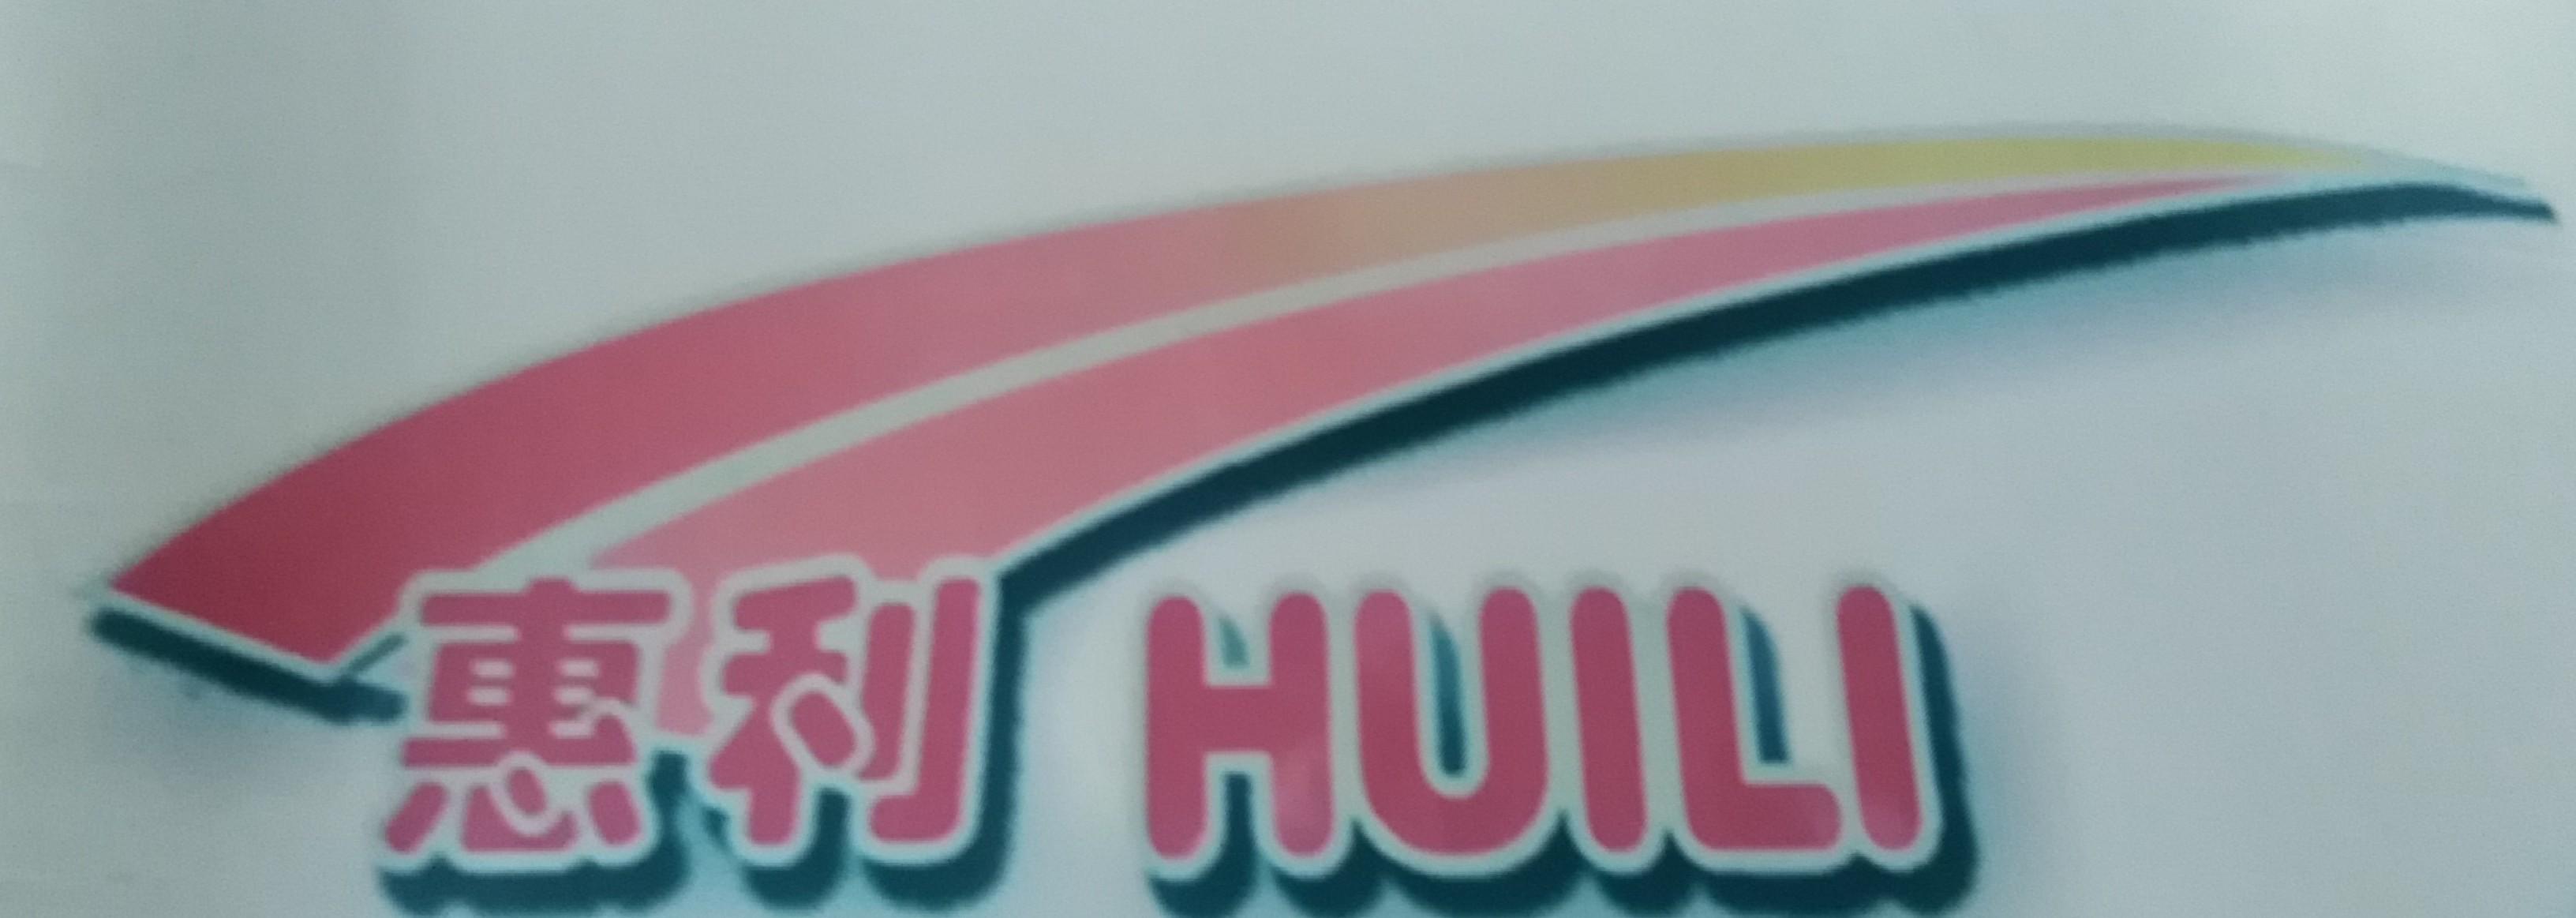 HUILI